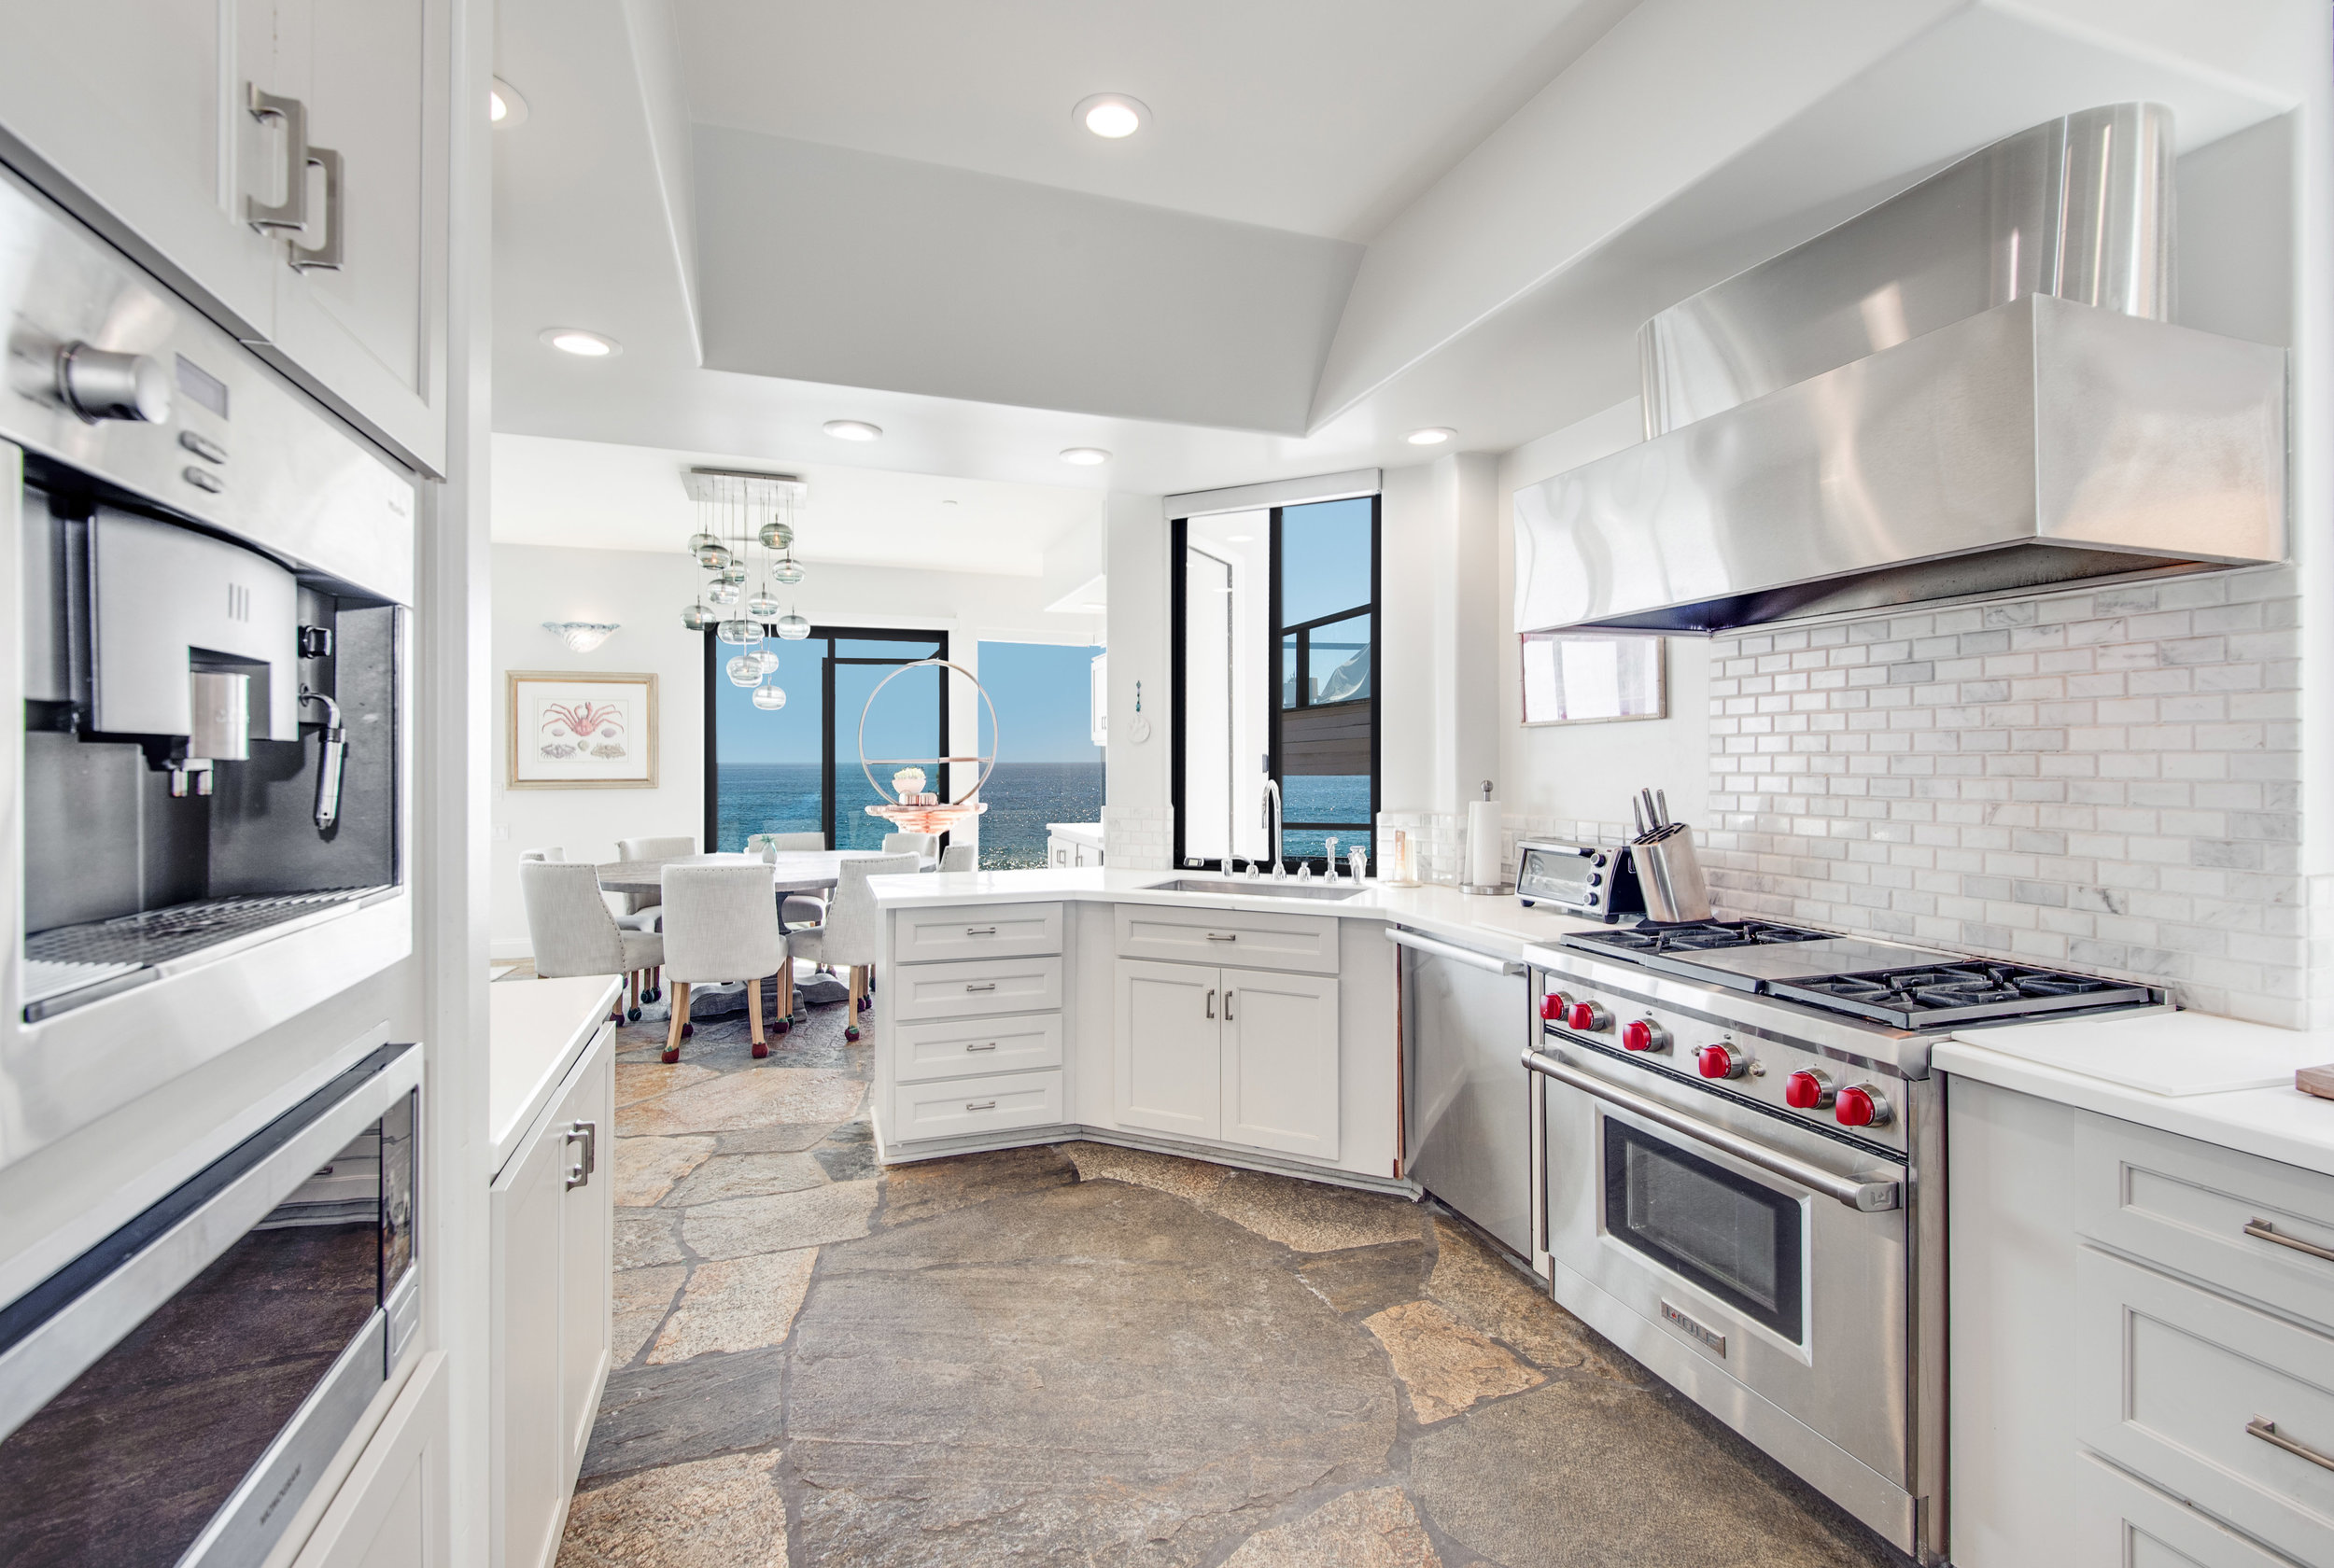 003 Kitchen 25252 Malibu Road For Sale Lease The Malibu Life Team Luxury Real Estate.jpg